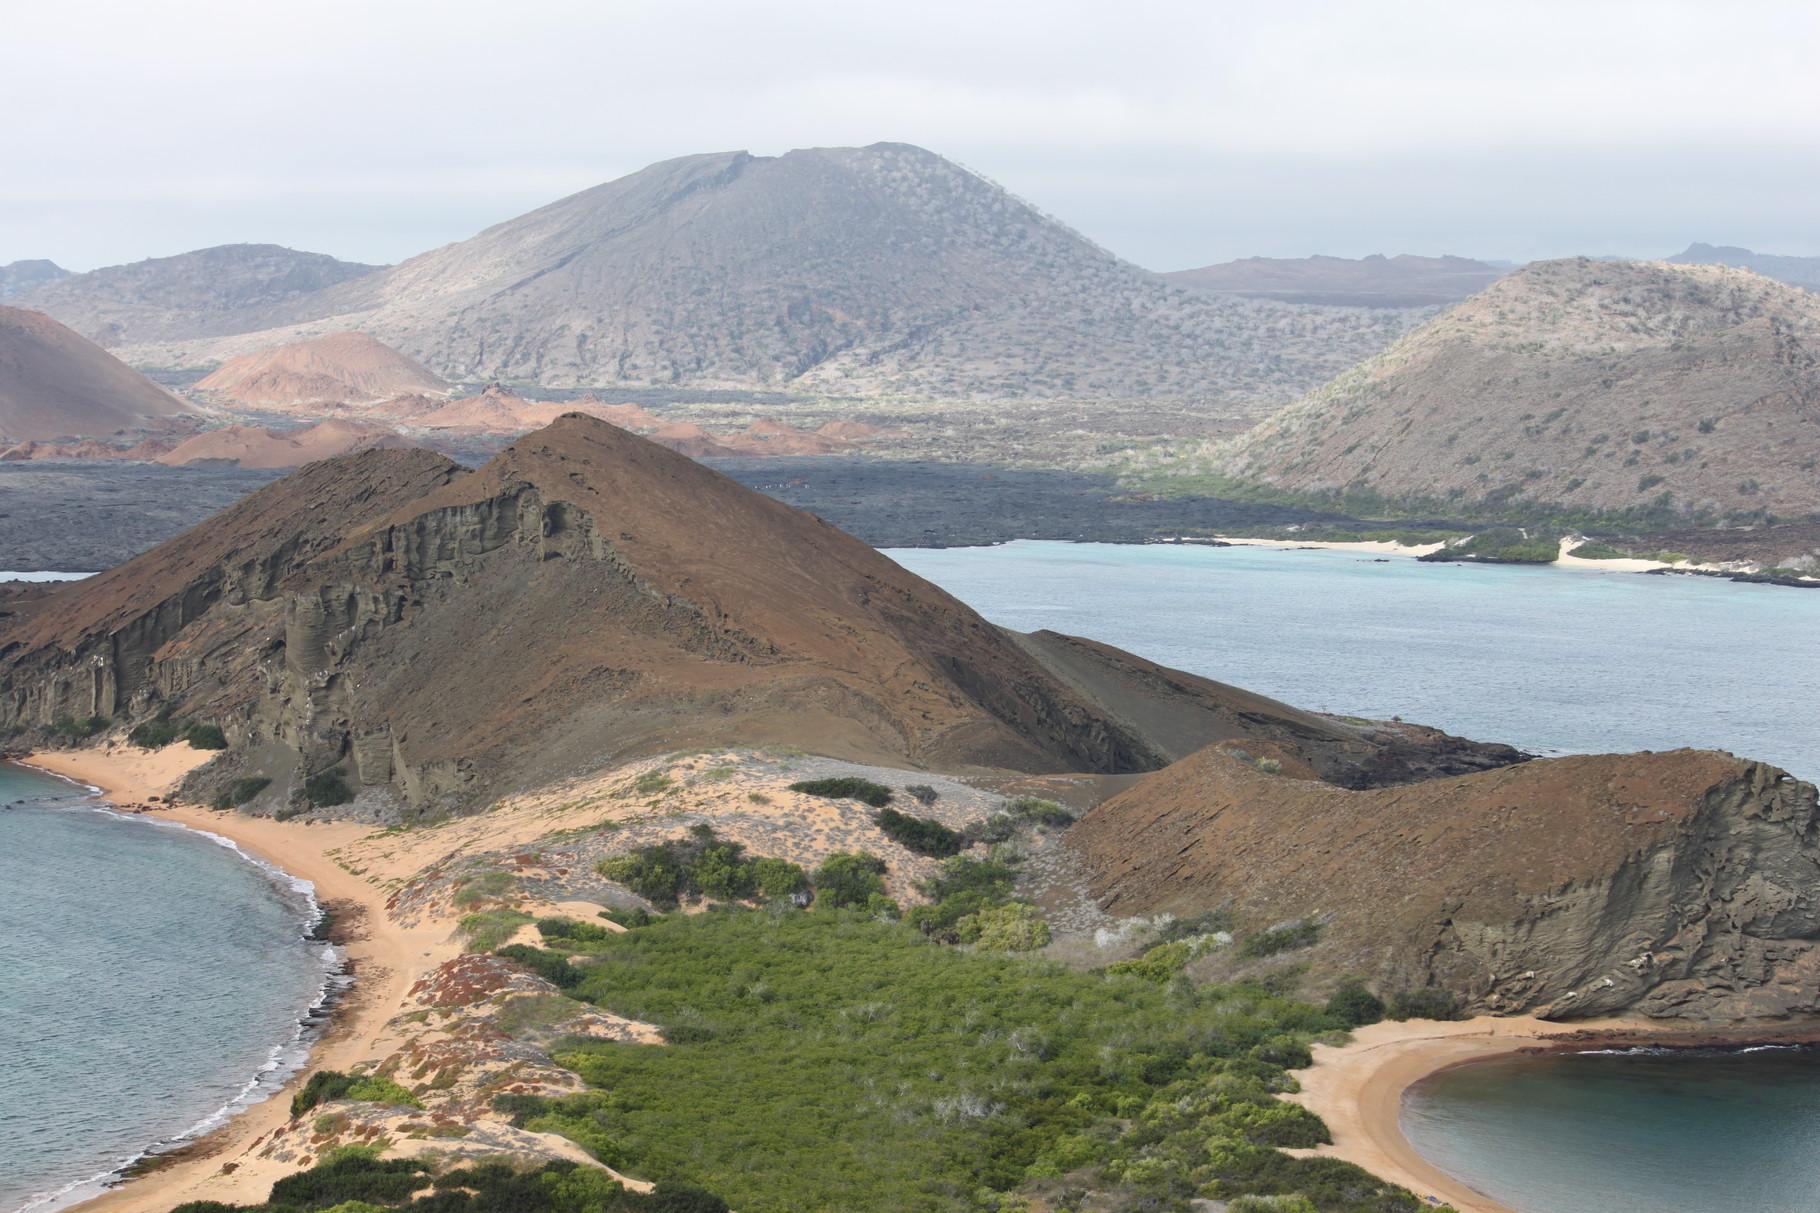 Galápagos inseln: Insel Bartolomé